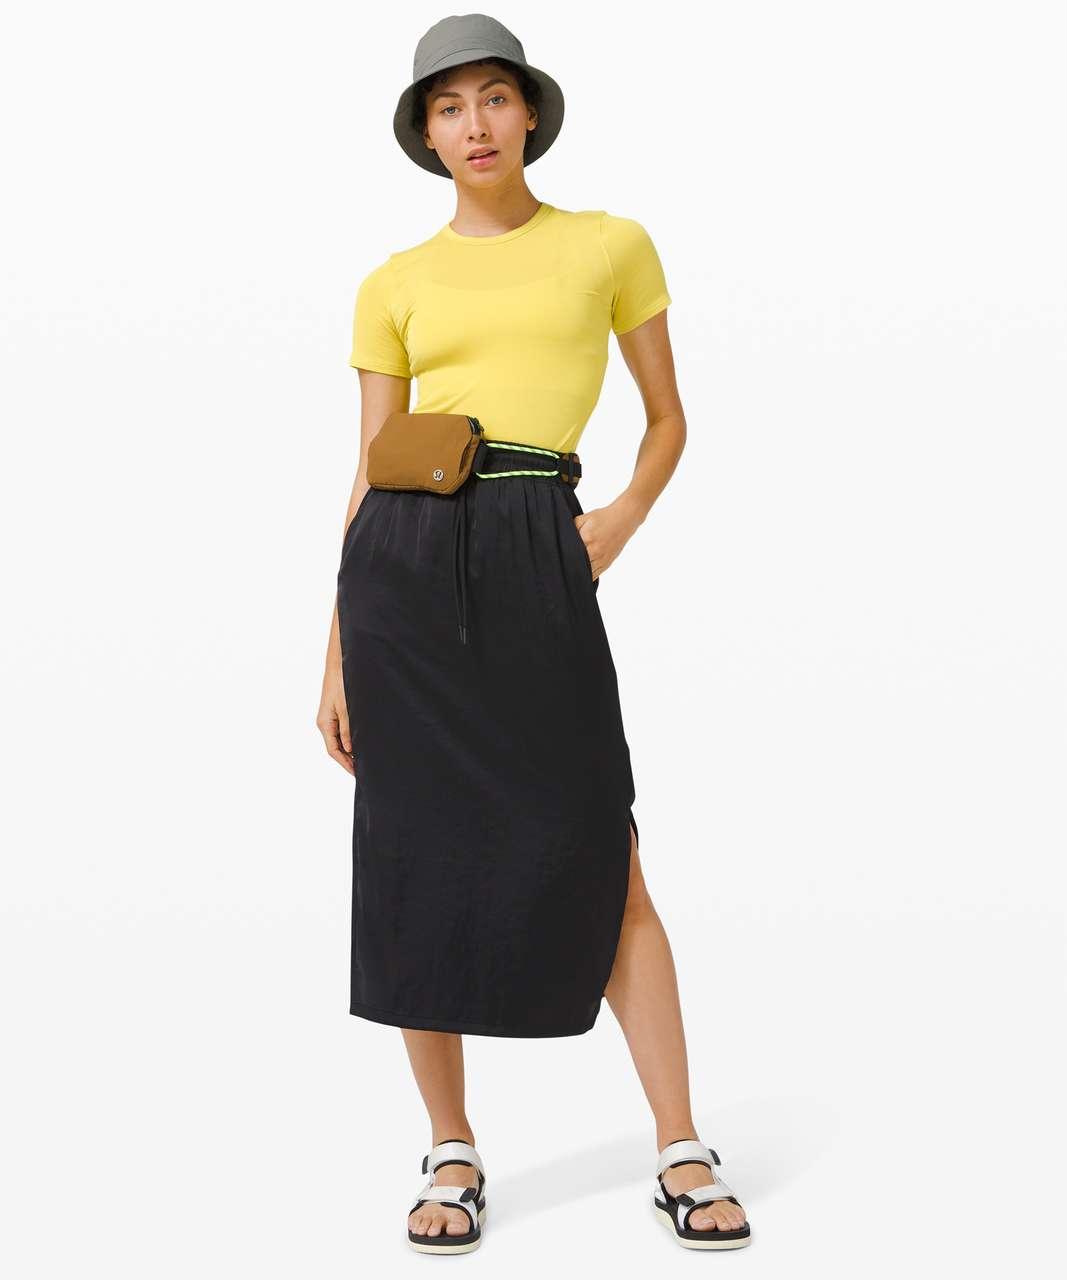 Lululemon Hold Tight Short Sleeve - Yellow Serpentine